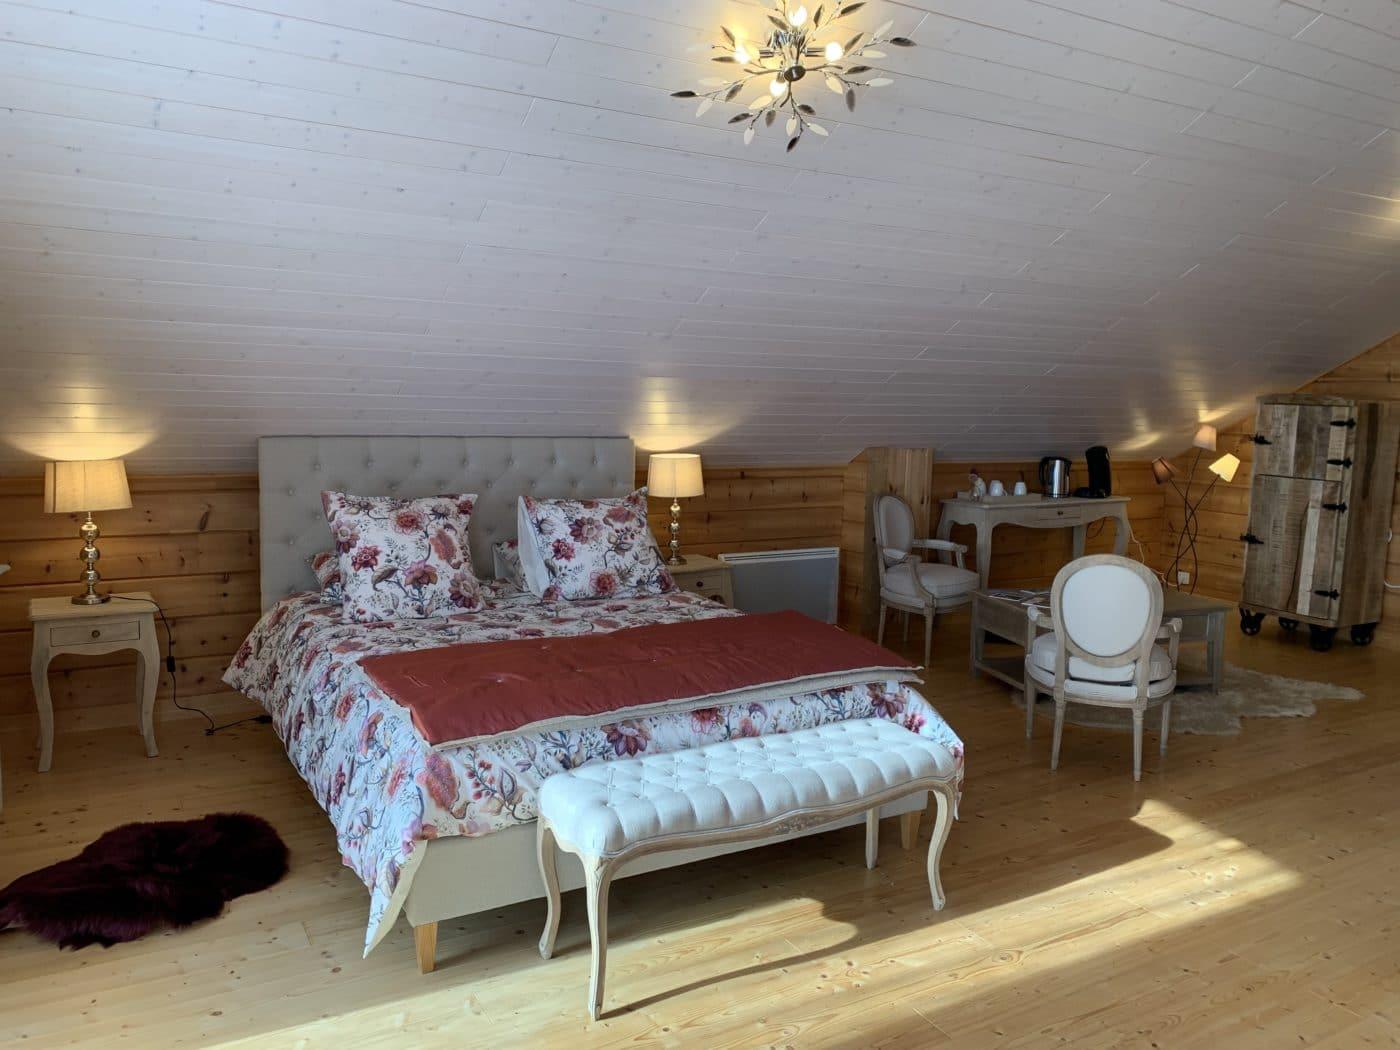 La Pouilly-chambre d'hote-o-refuge-divin-bannay-sancerre-cher